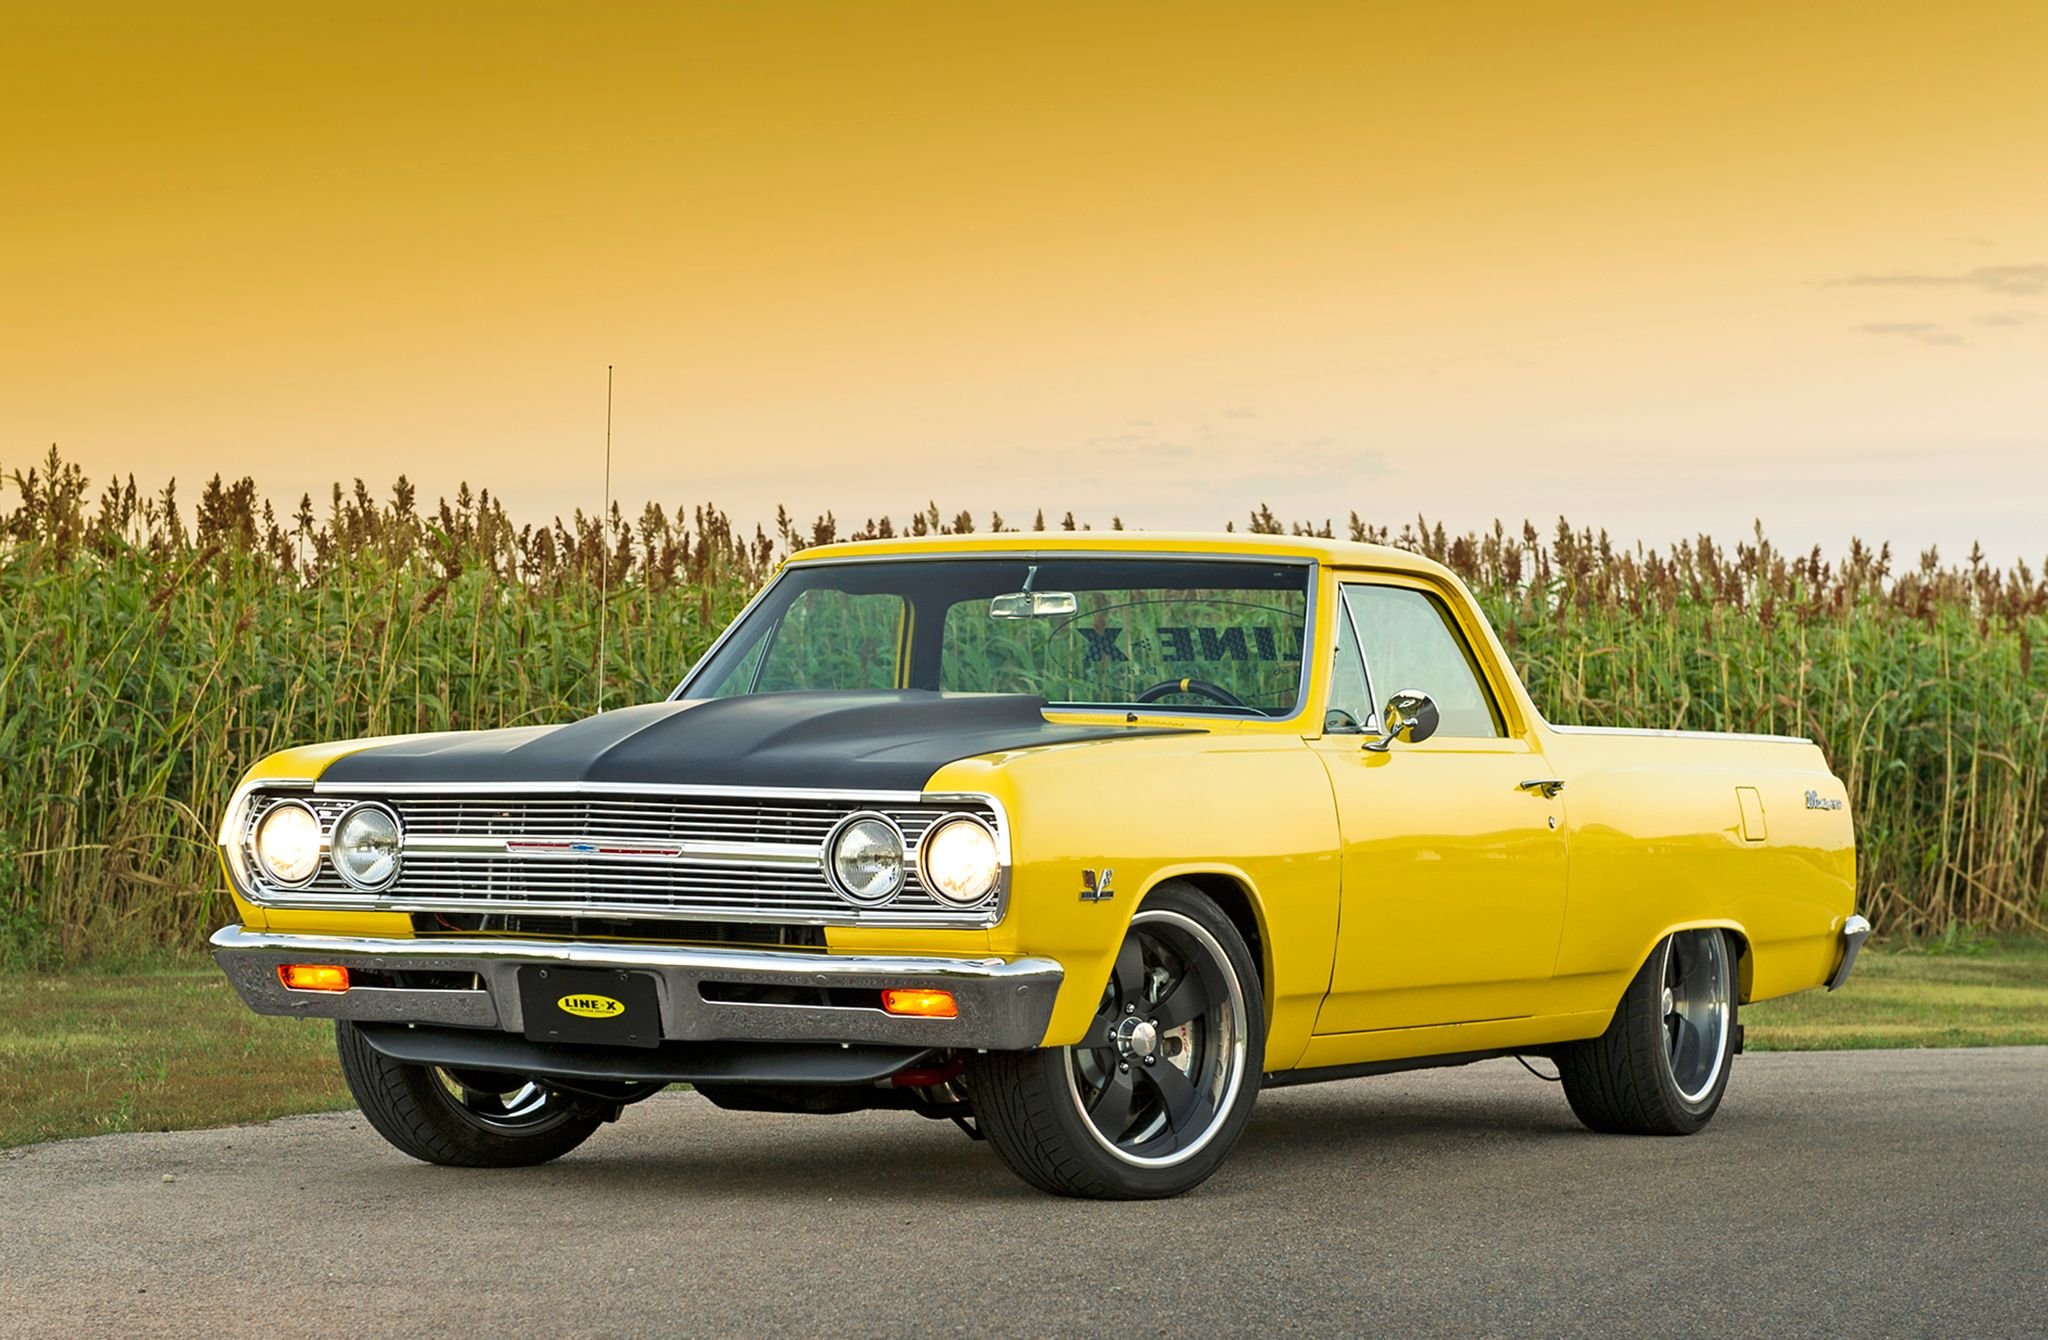 1965 Chevrolet El Camino-01 wallpaper